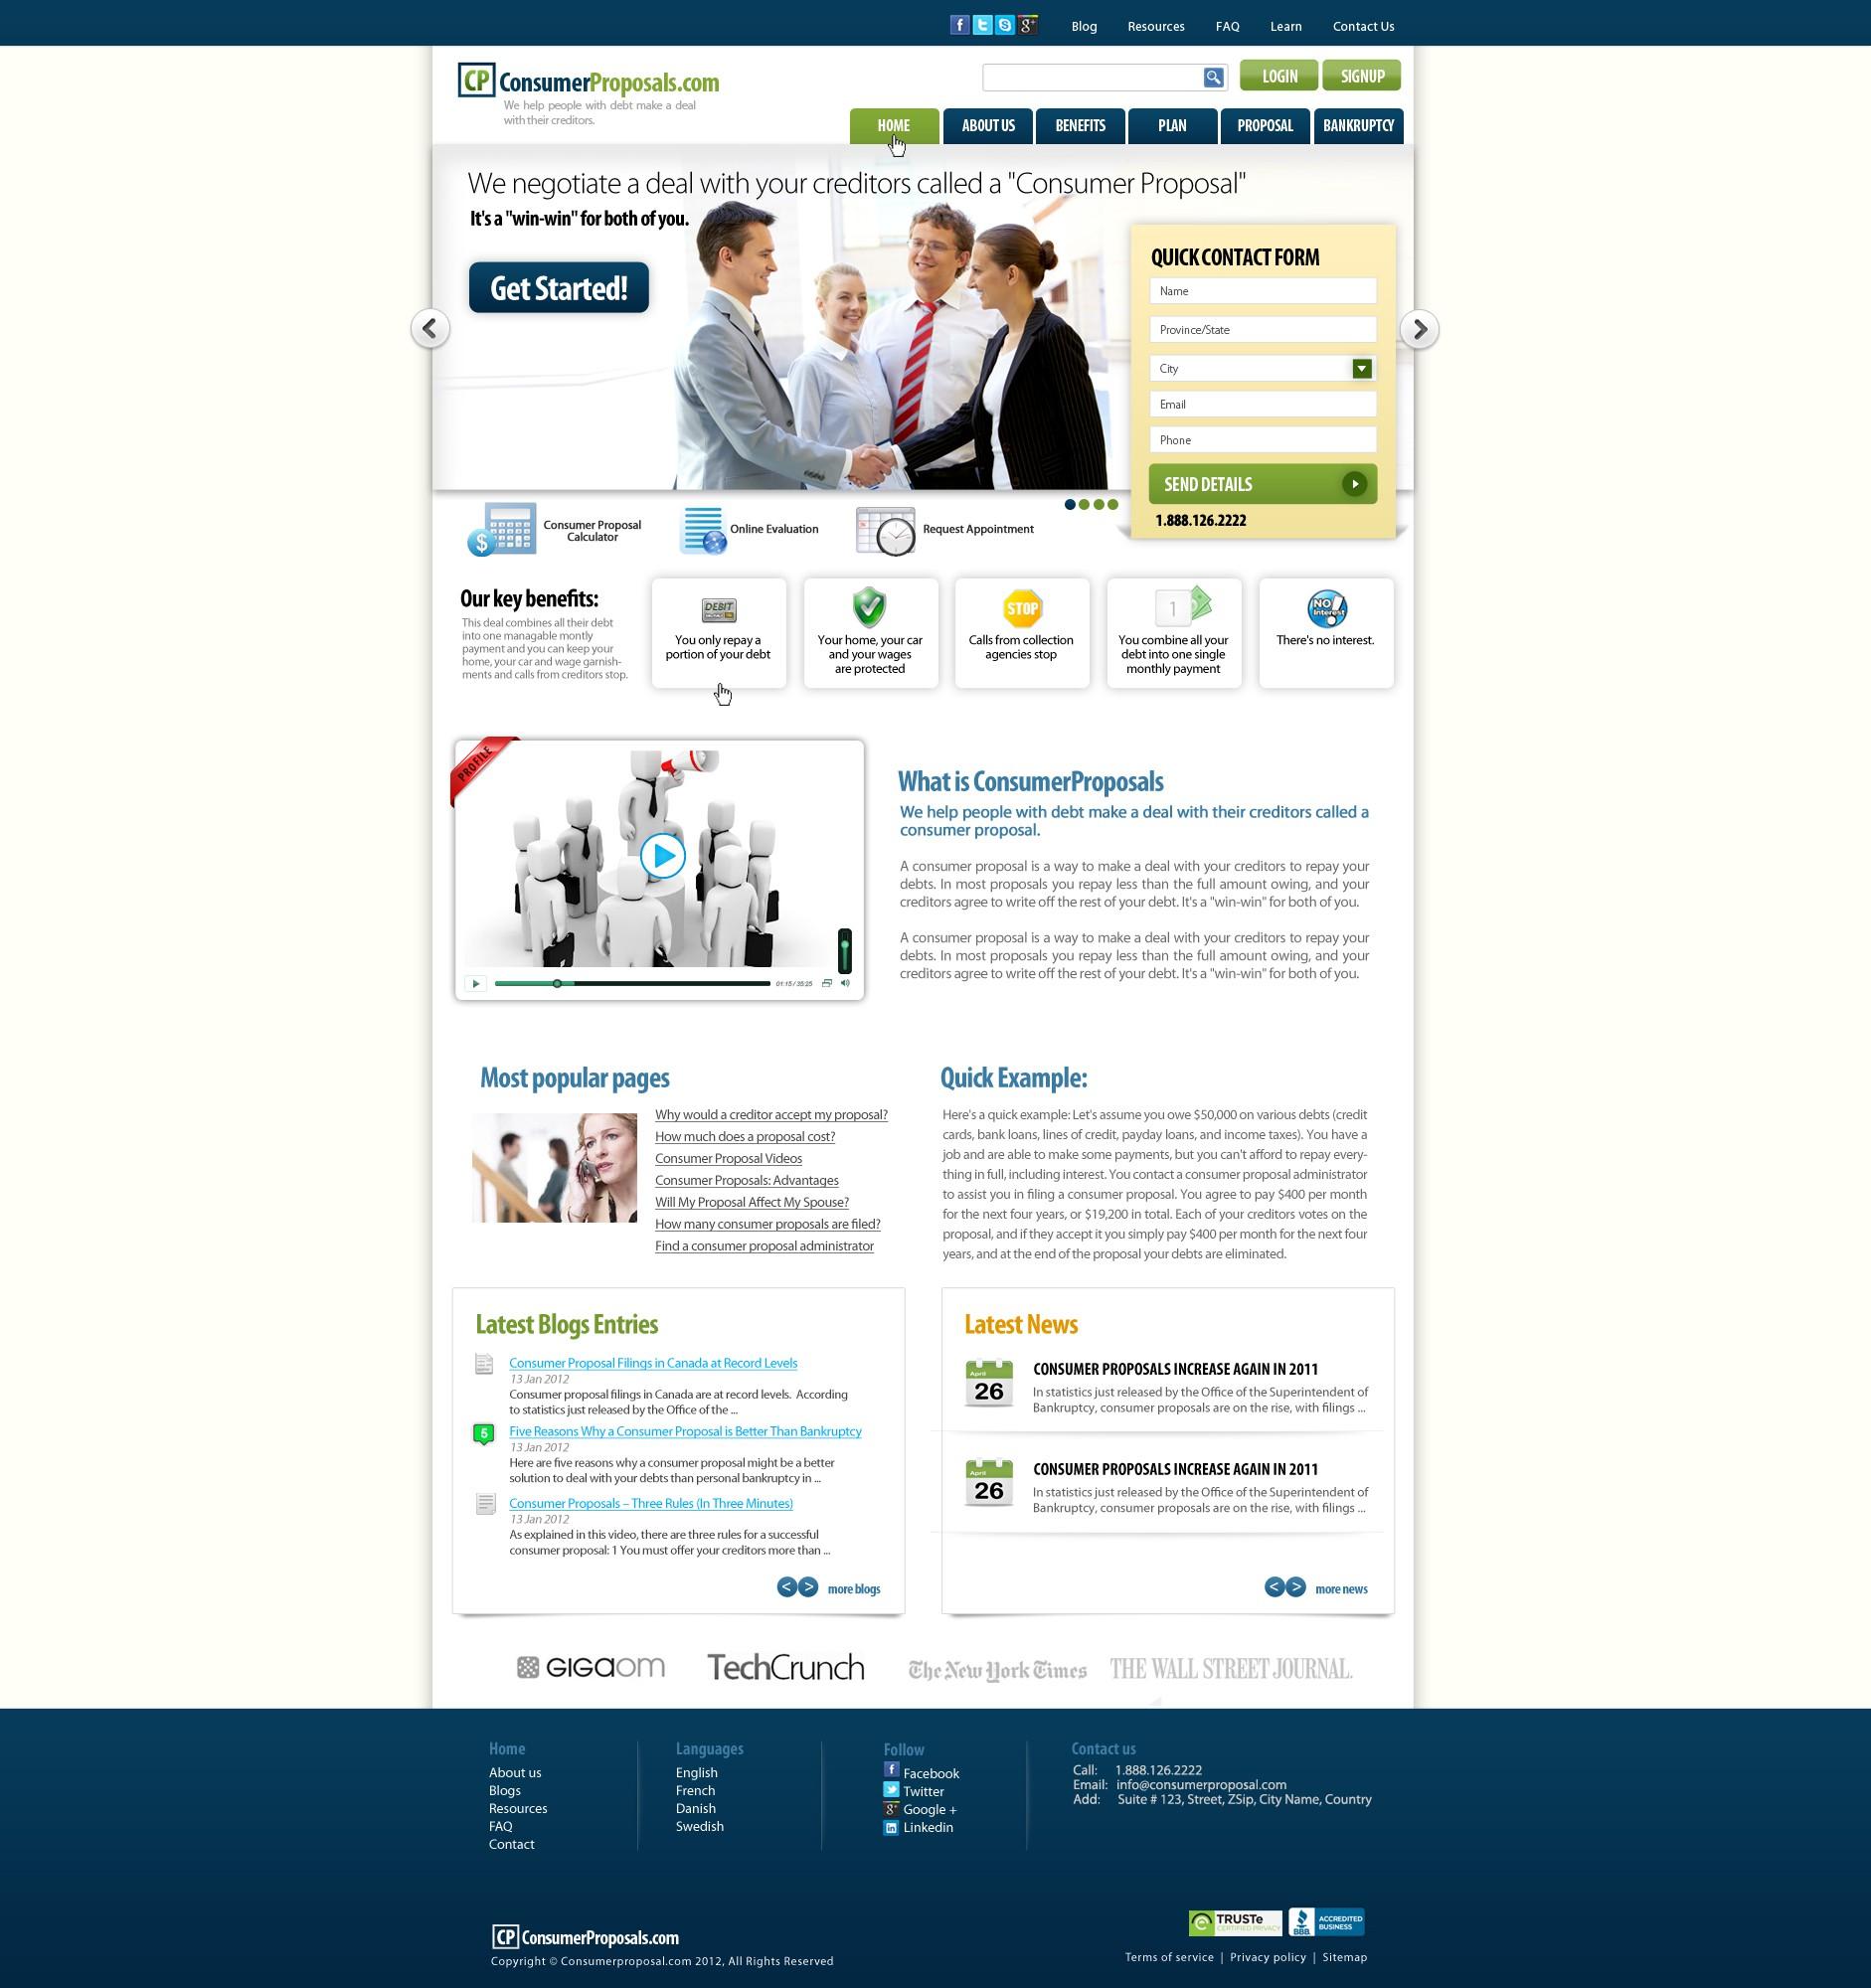 Create the next website design for ConsumerProposals.com